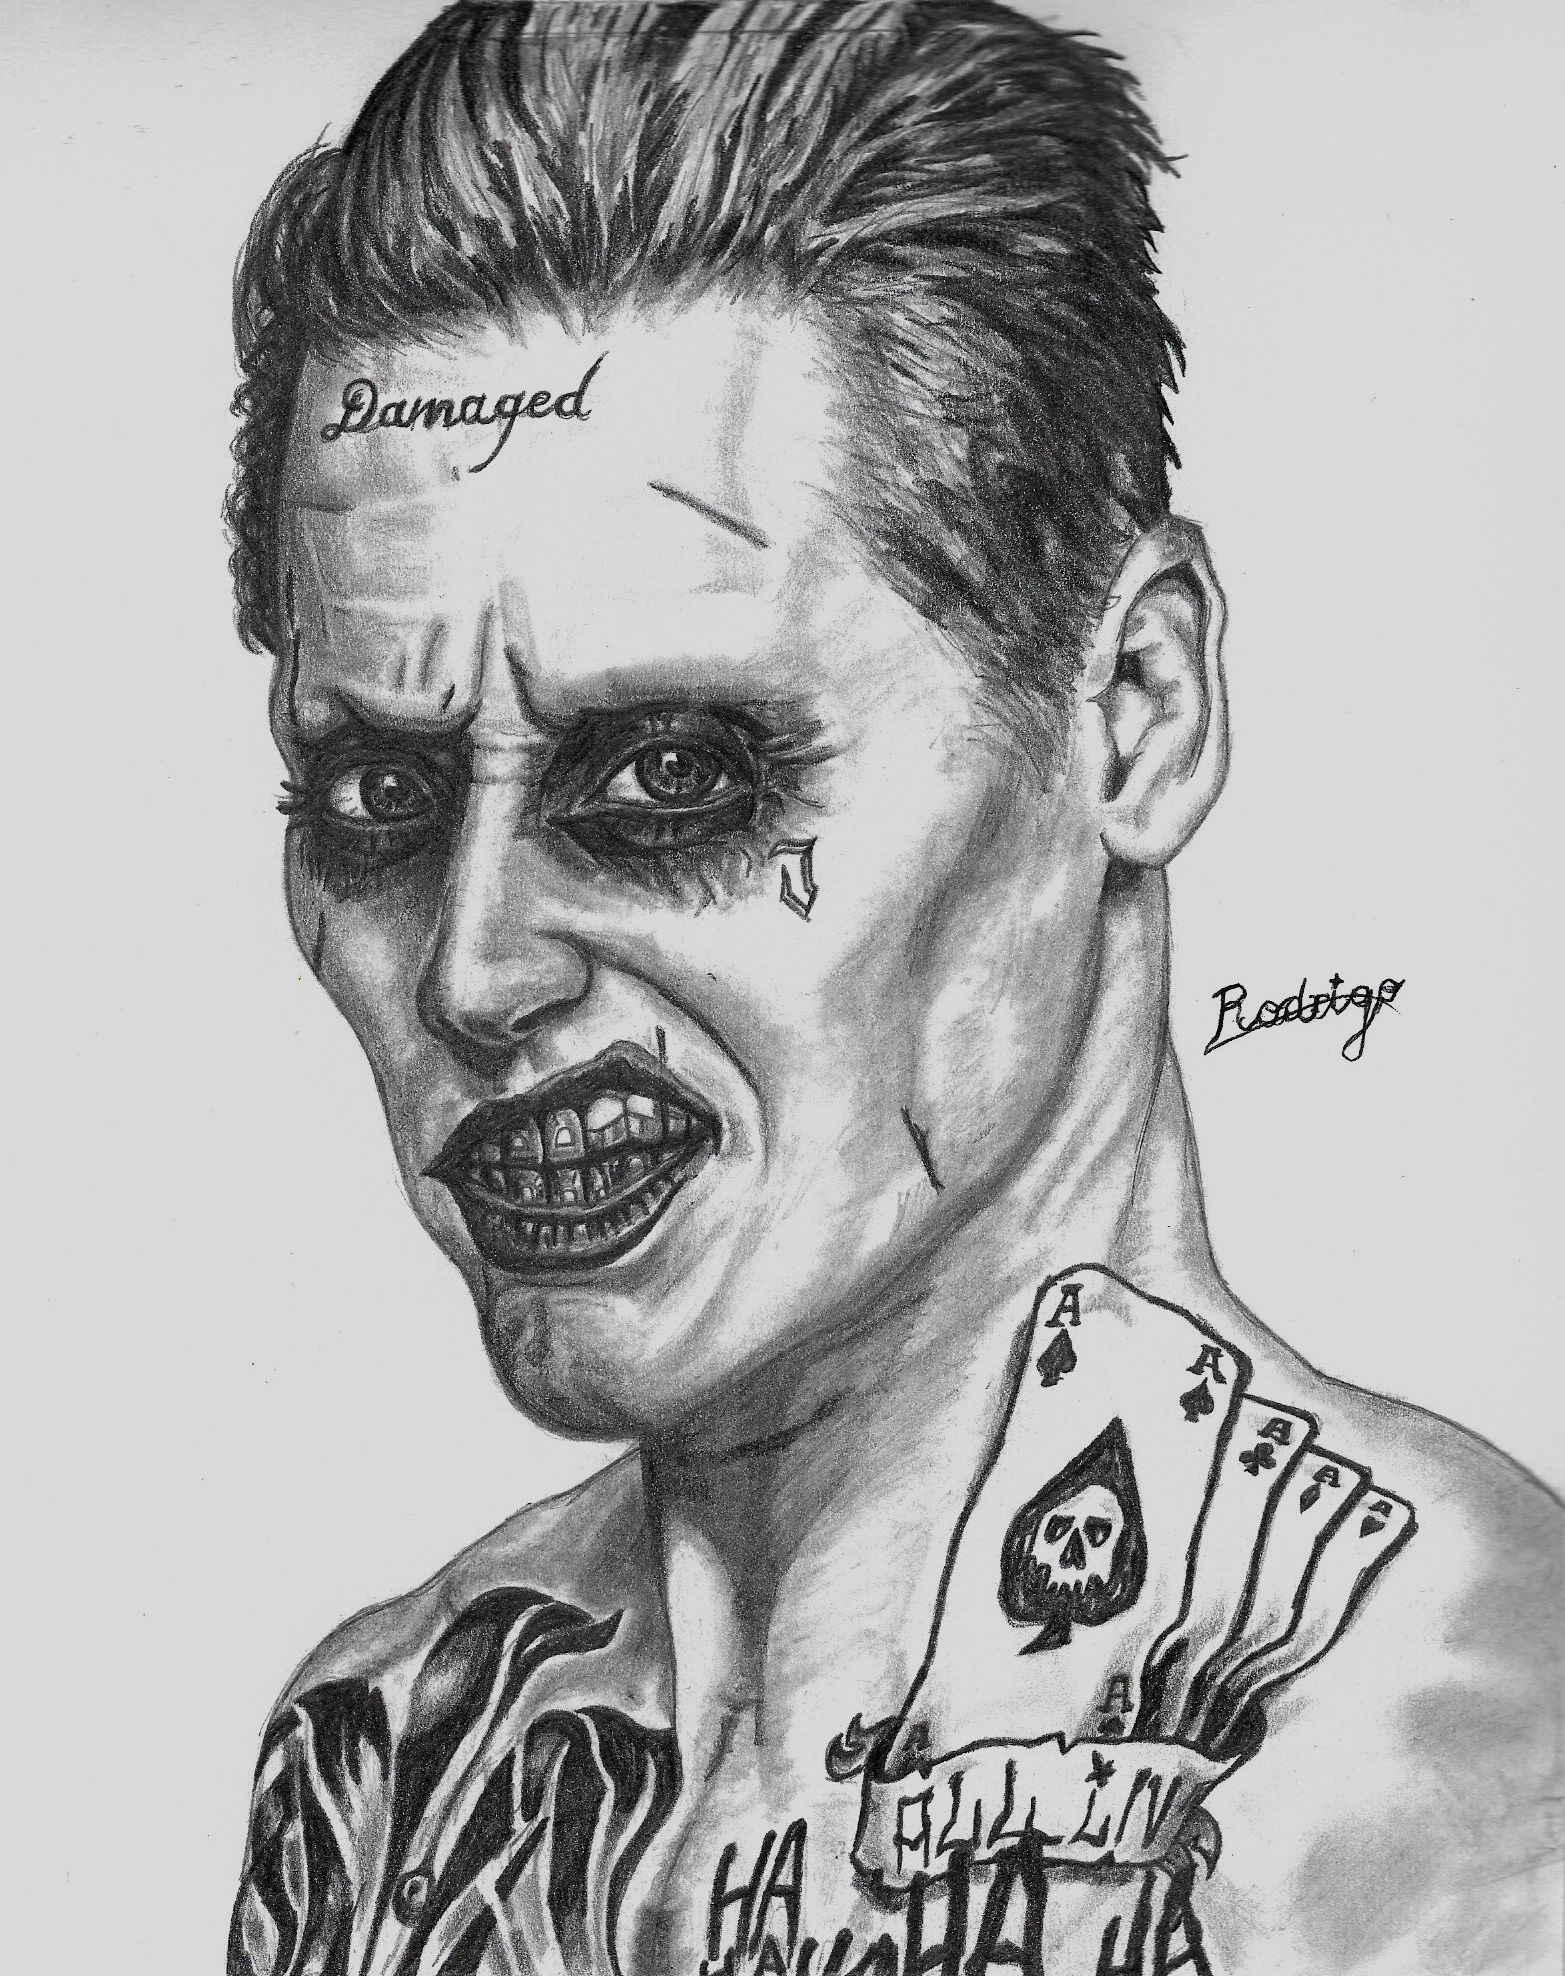 Joker From Suicide Squad (Jared Leto) By RodrigoSojo14 On